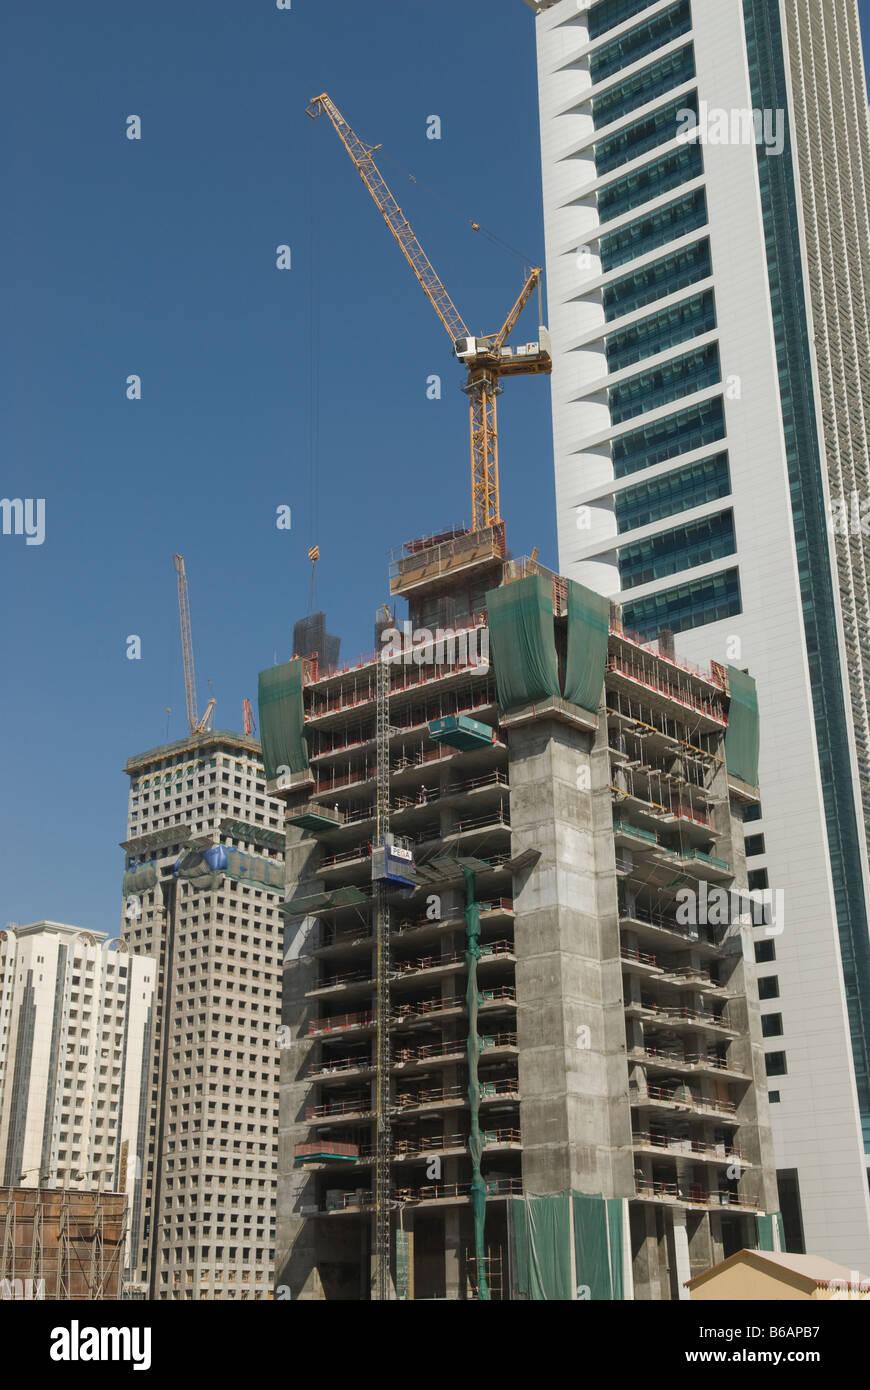 Construction site in Dubai. Stock Photo